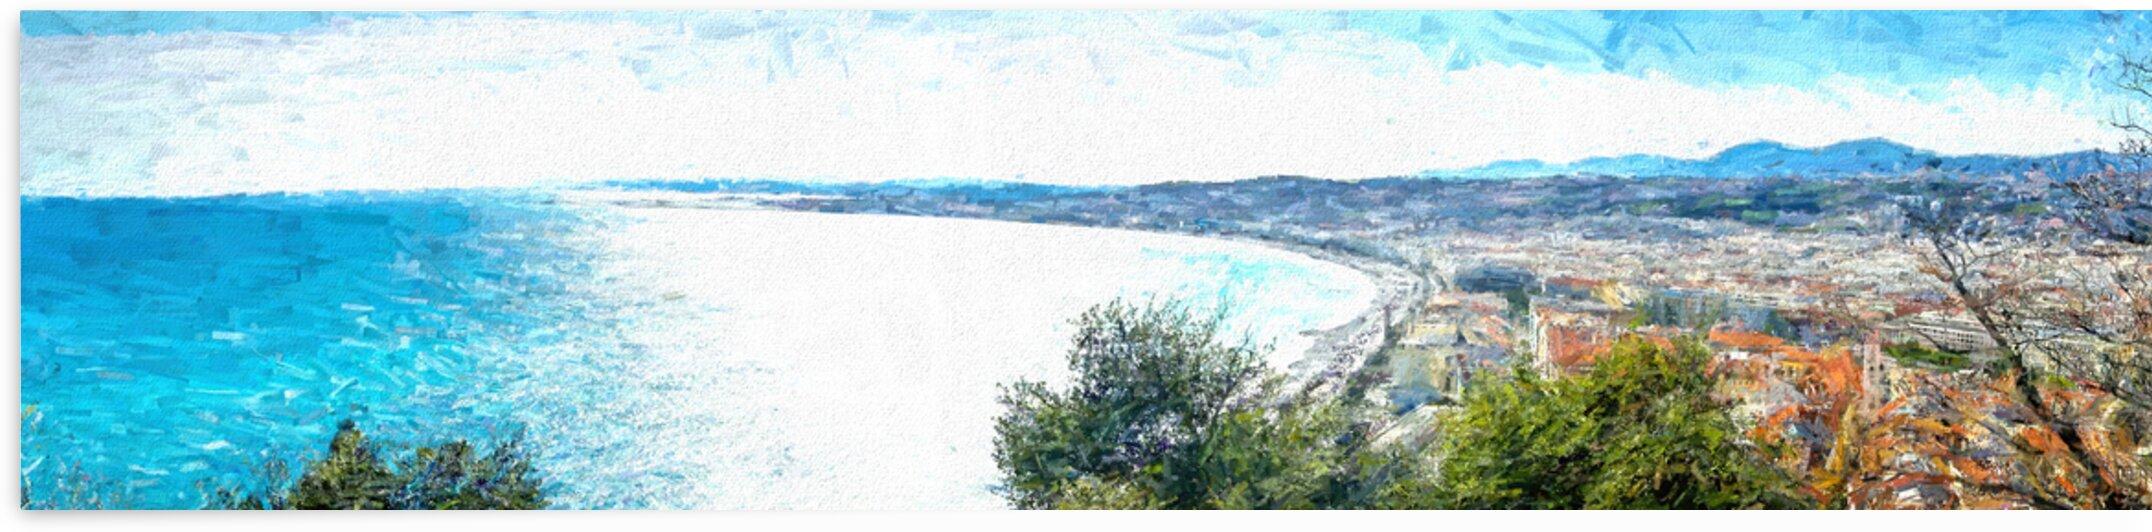 top panorama nice beach studio 2 by realimpressions